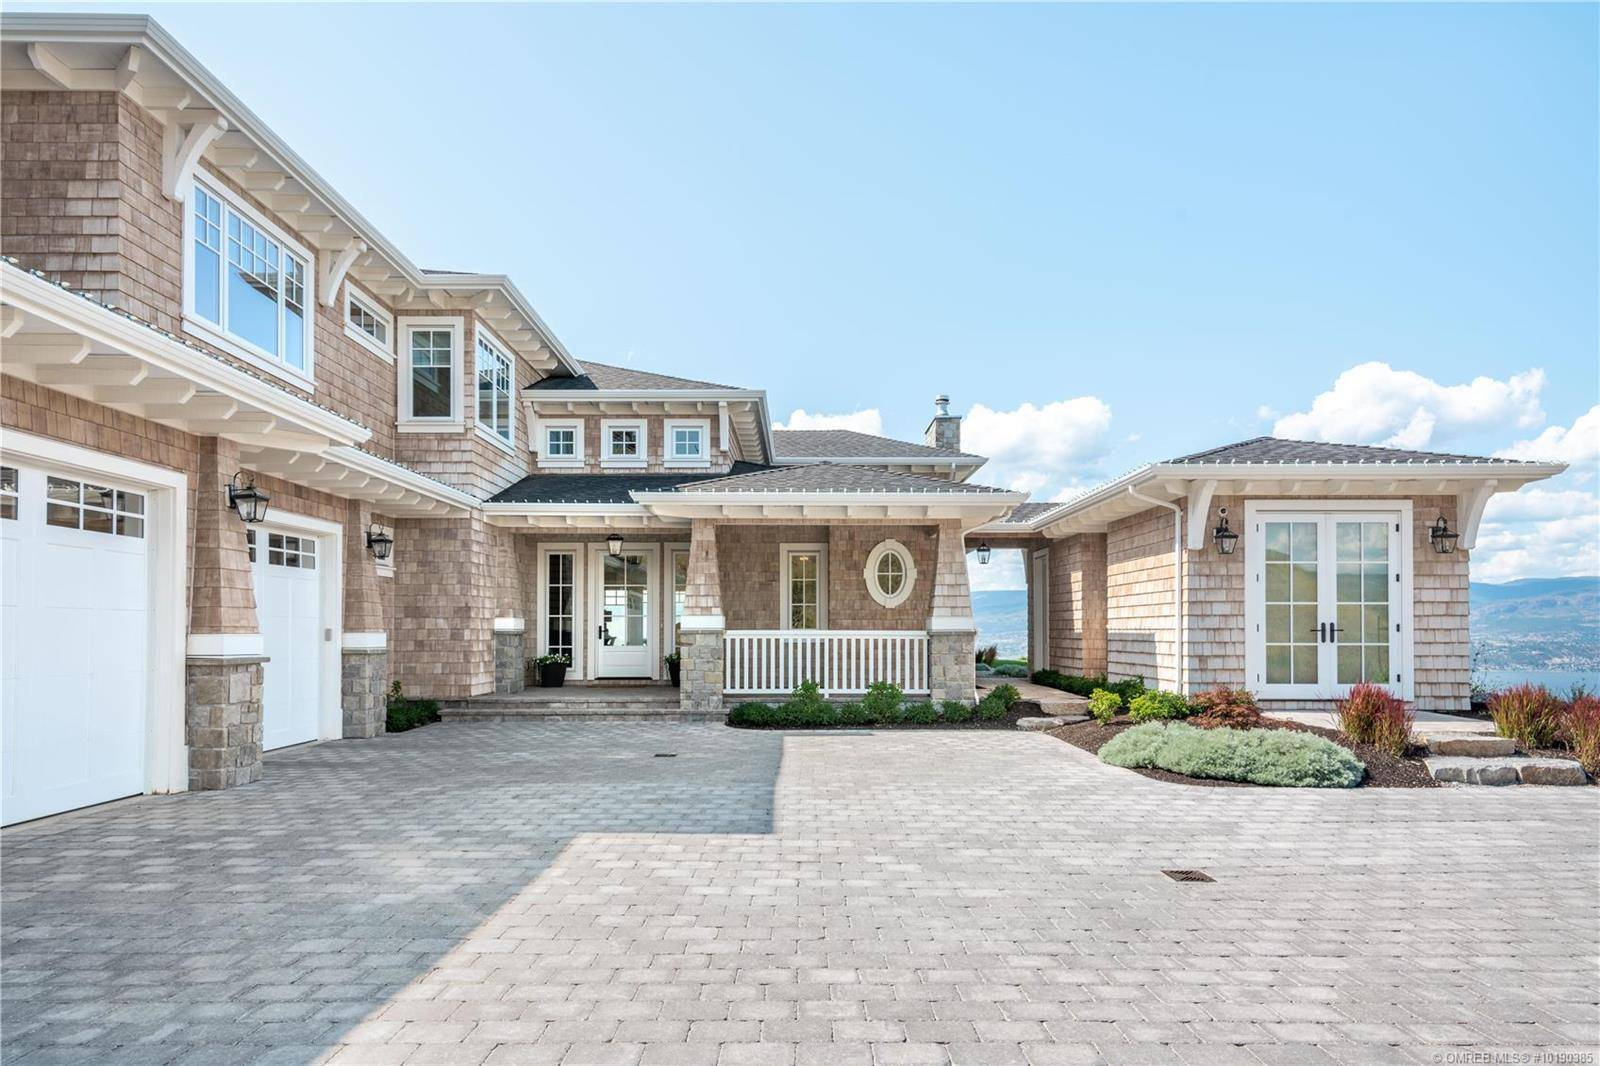 House for sale at 940 Lakecrest Ct Kelowna British Columbia - MLS: 10190385